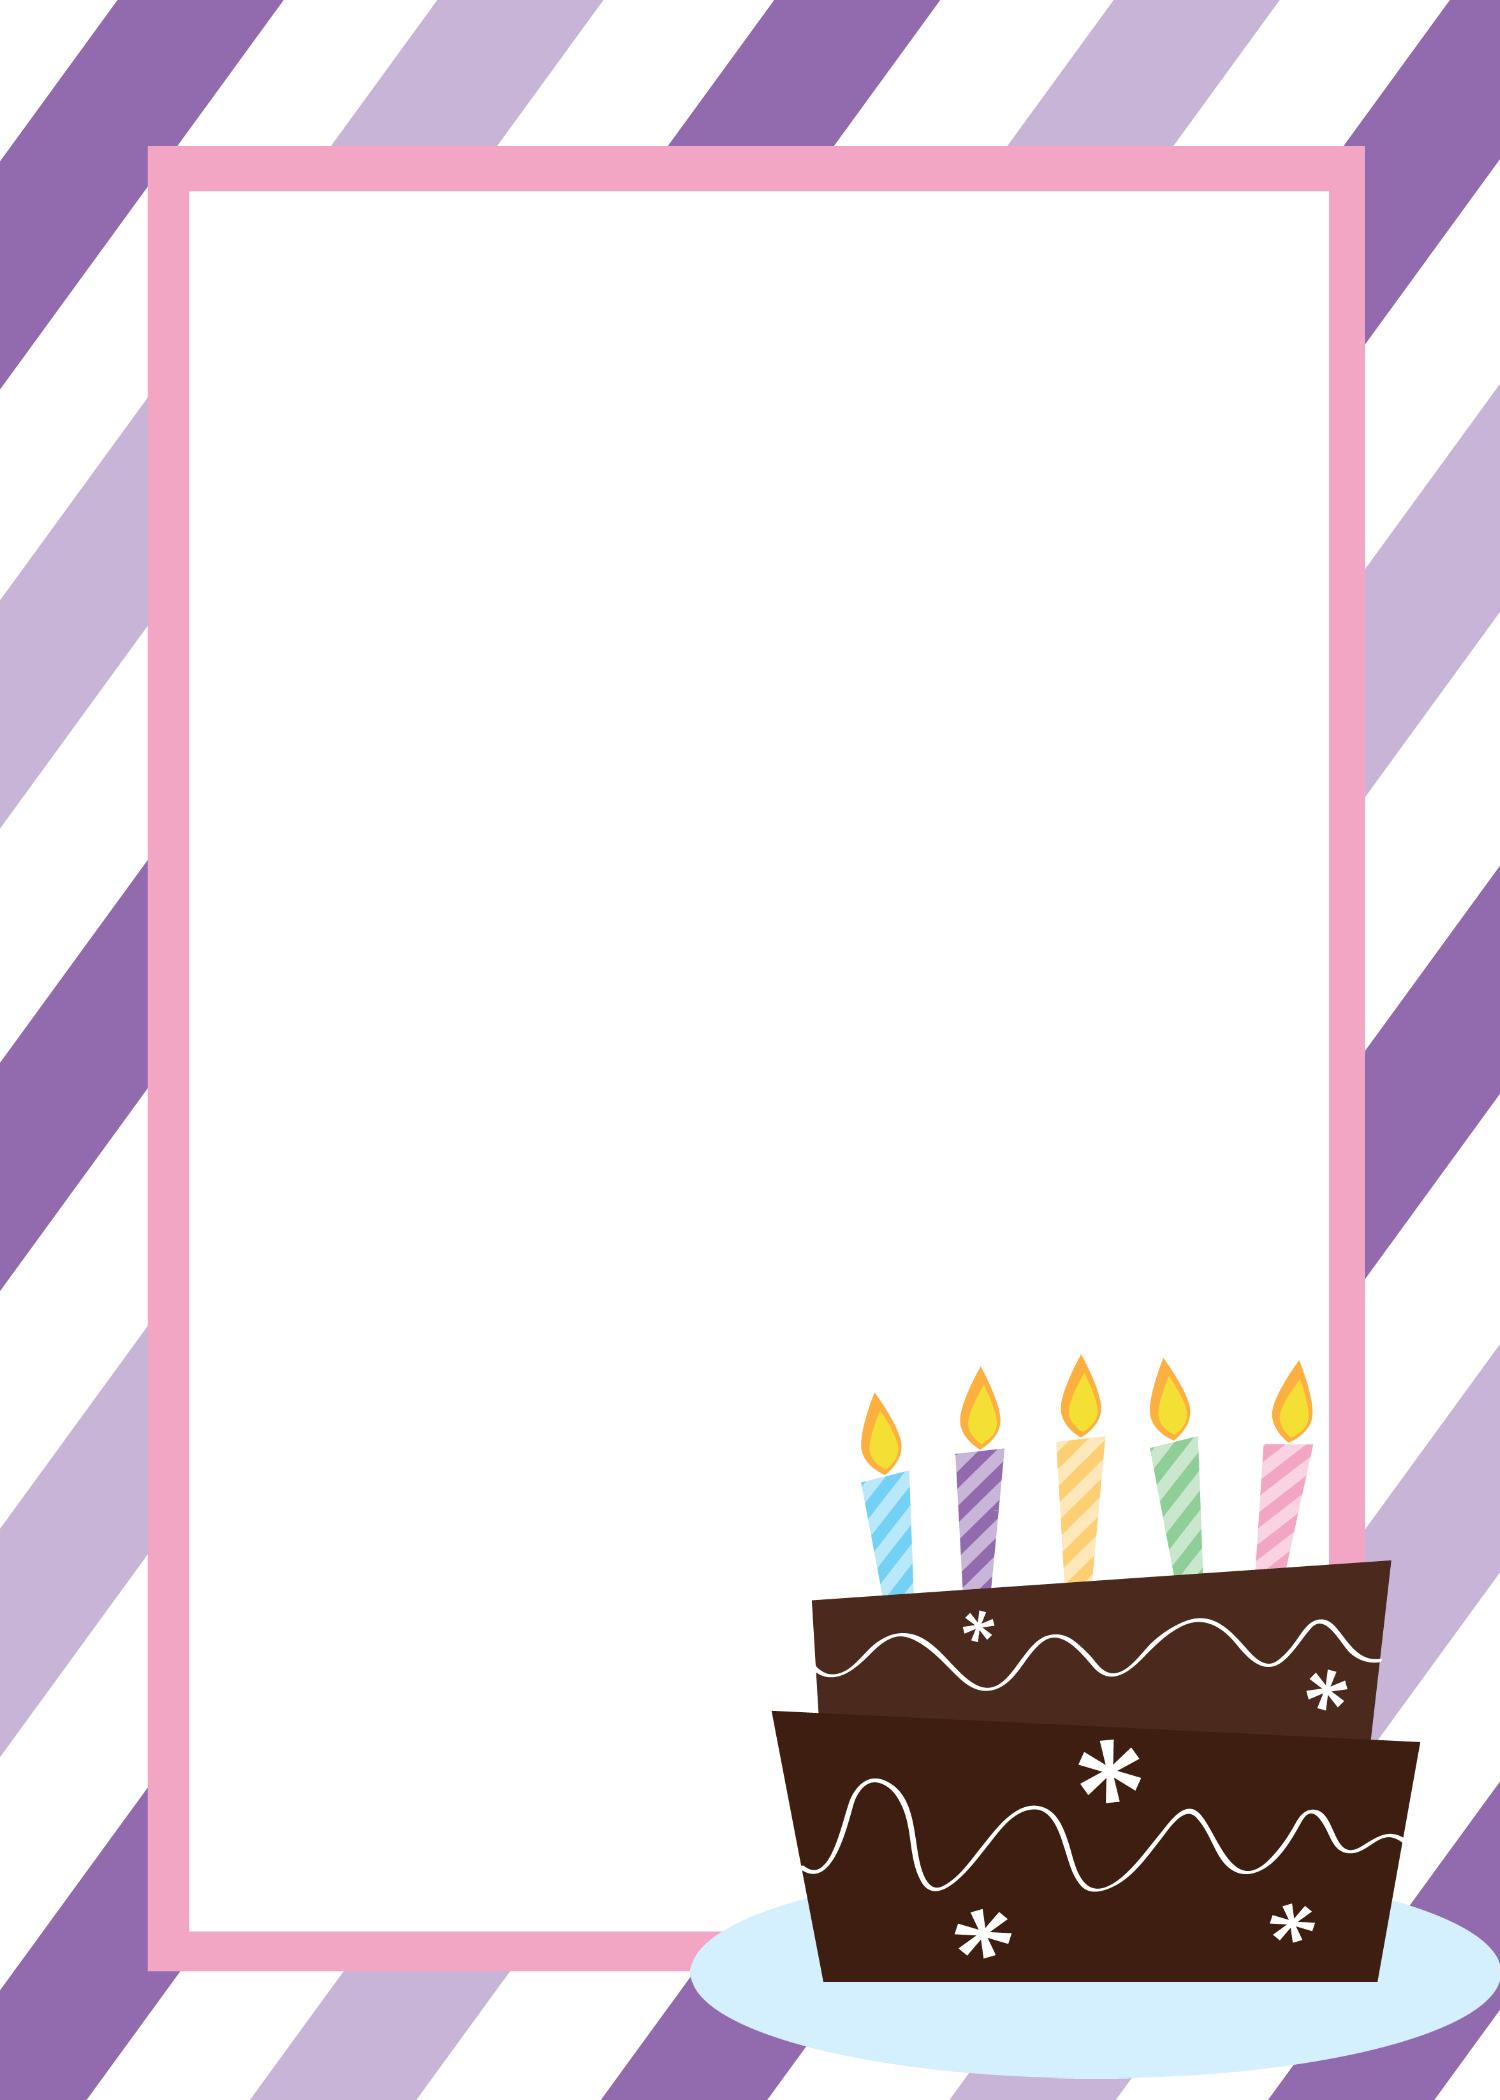 Free Printable Birthday Invitation Templates - Free Printable Birthday Invitation Templates